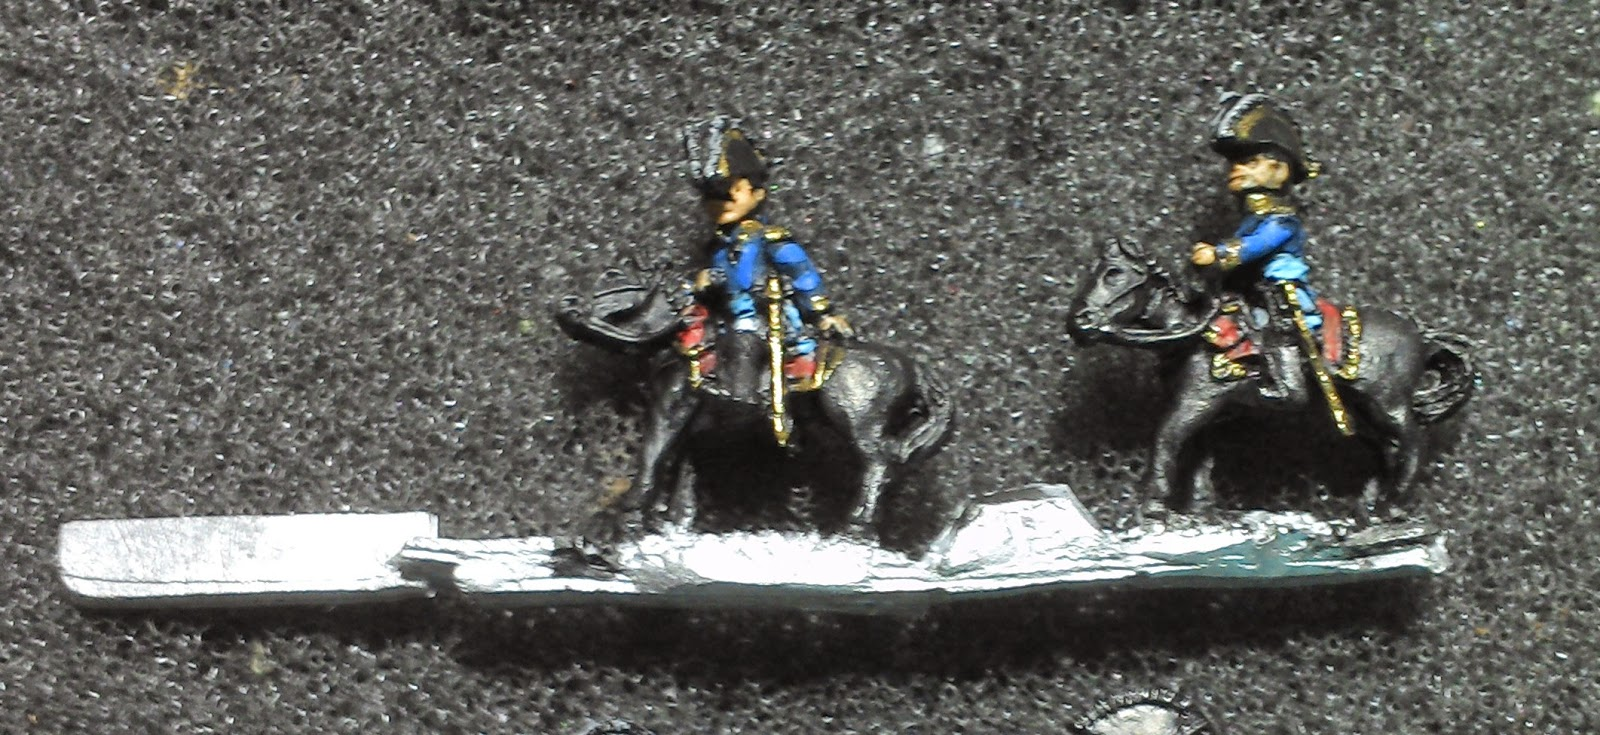 Peindre des figurines de 6mm Generaux+de+brigade